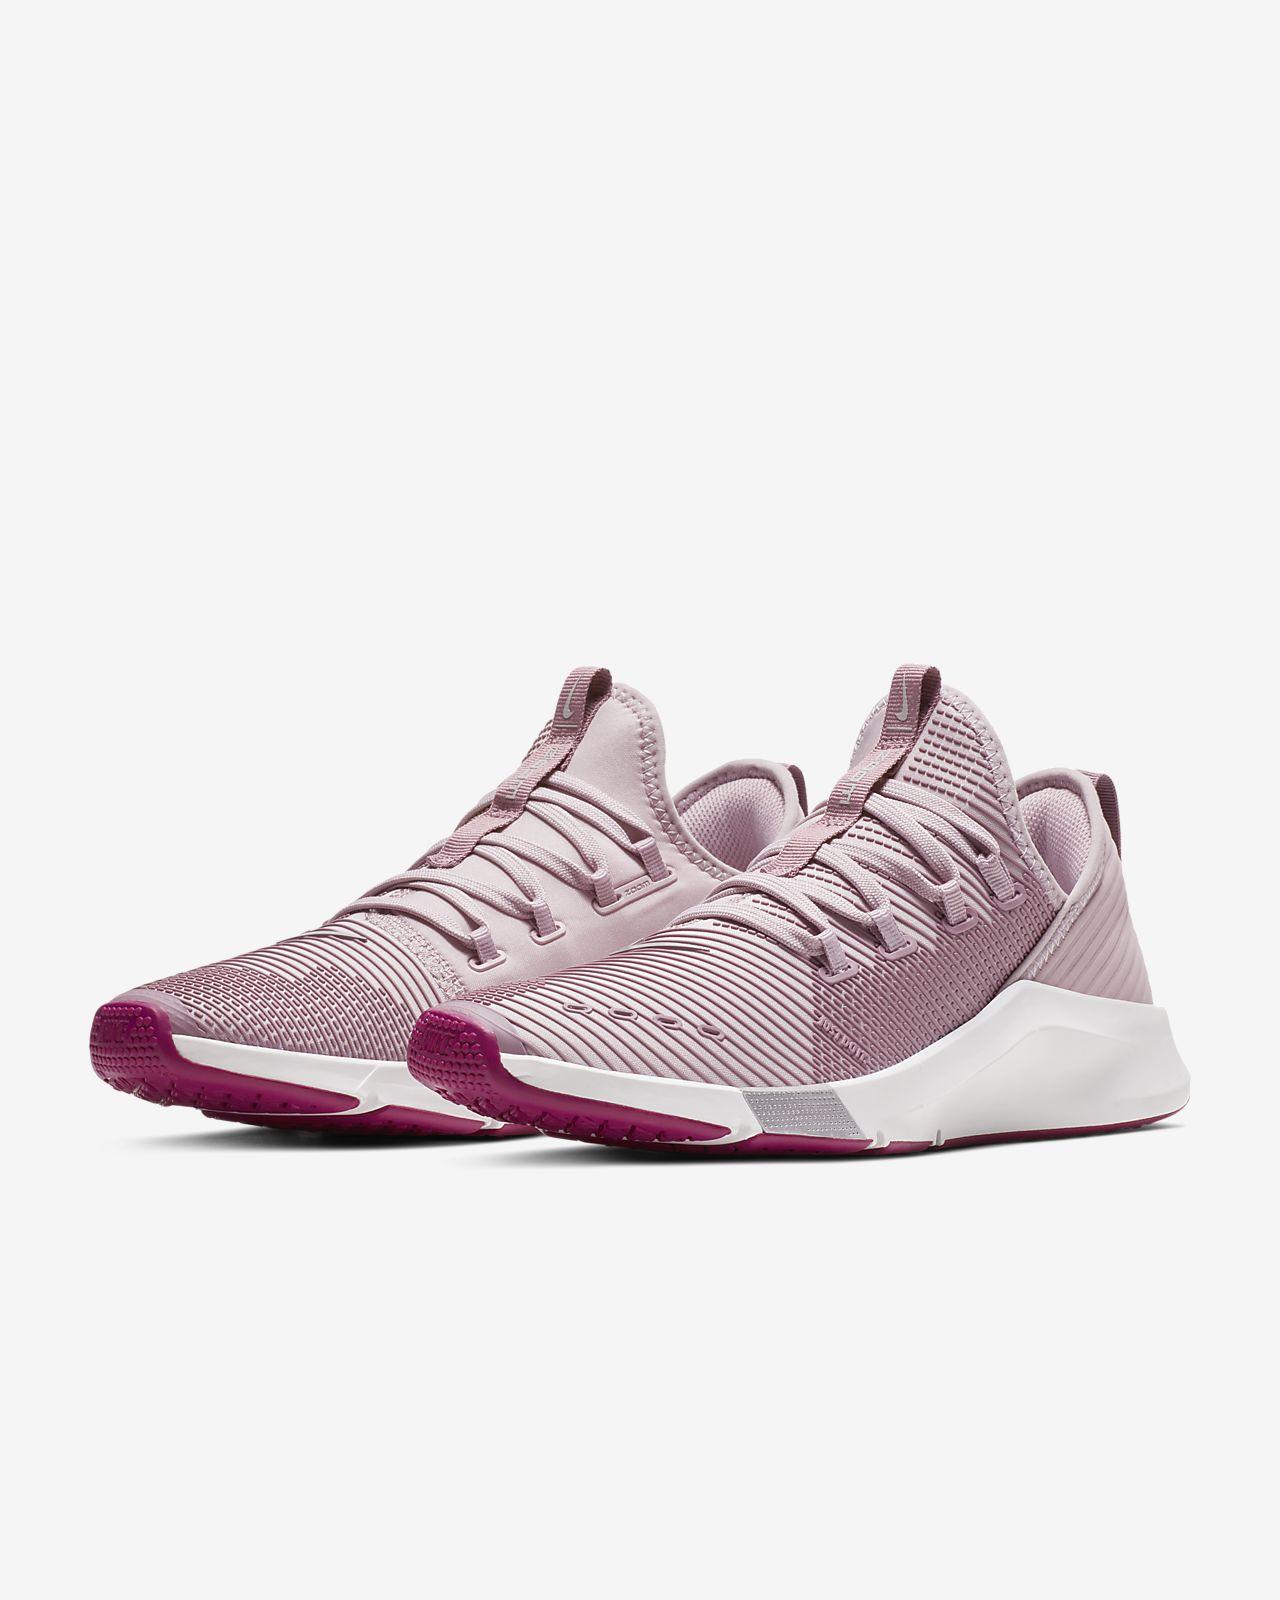 promo code c0804 ecbf8 ... Nike Air Zoom Elevate Womens GymTrainingBoxing Shoe